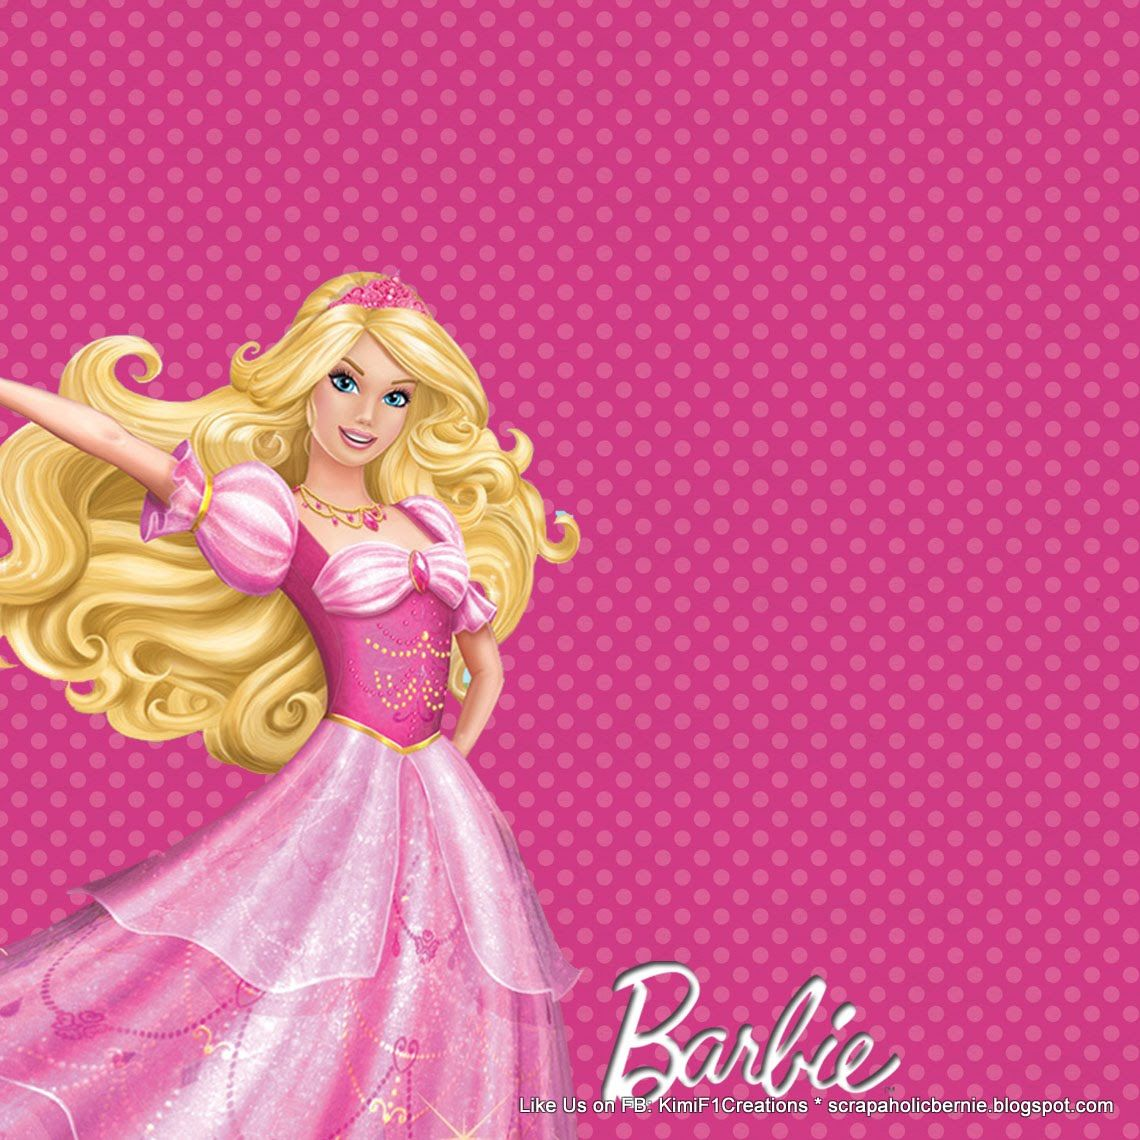 Barbie Birthday Invitation Card Template Birthday Invitation - Free barbie birthday invitation layout